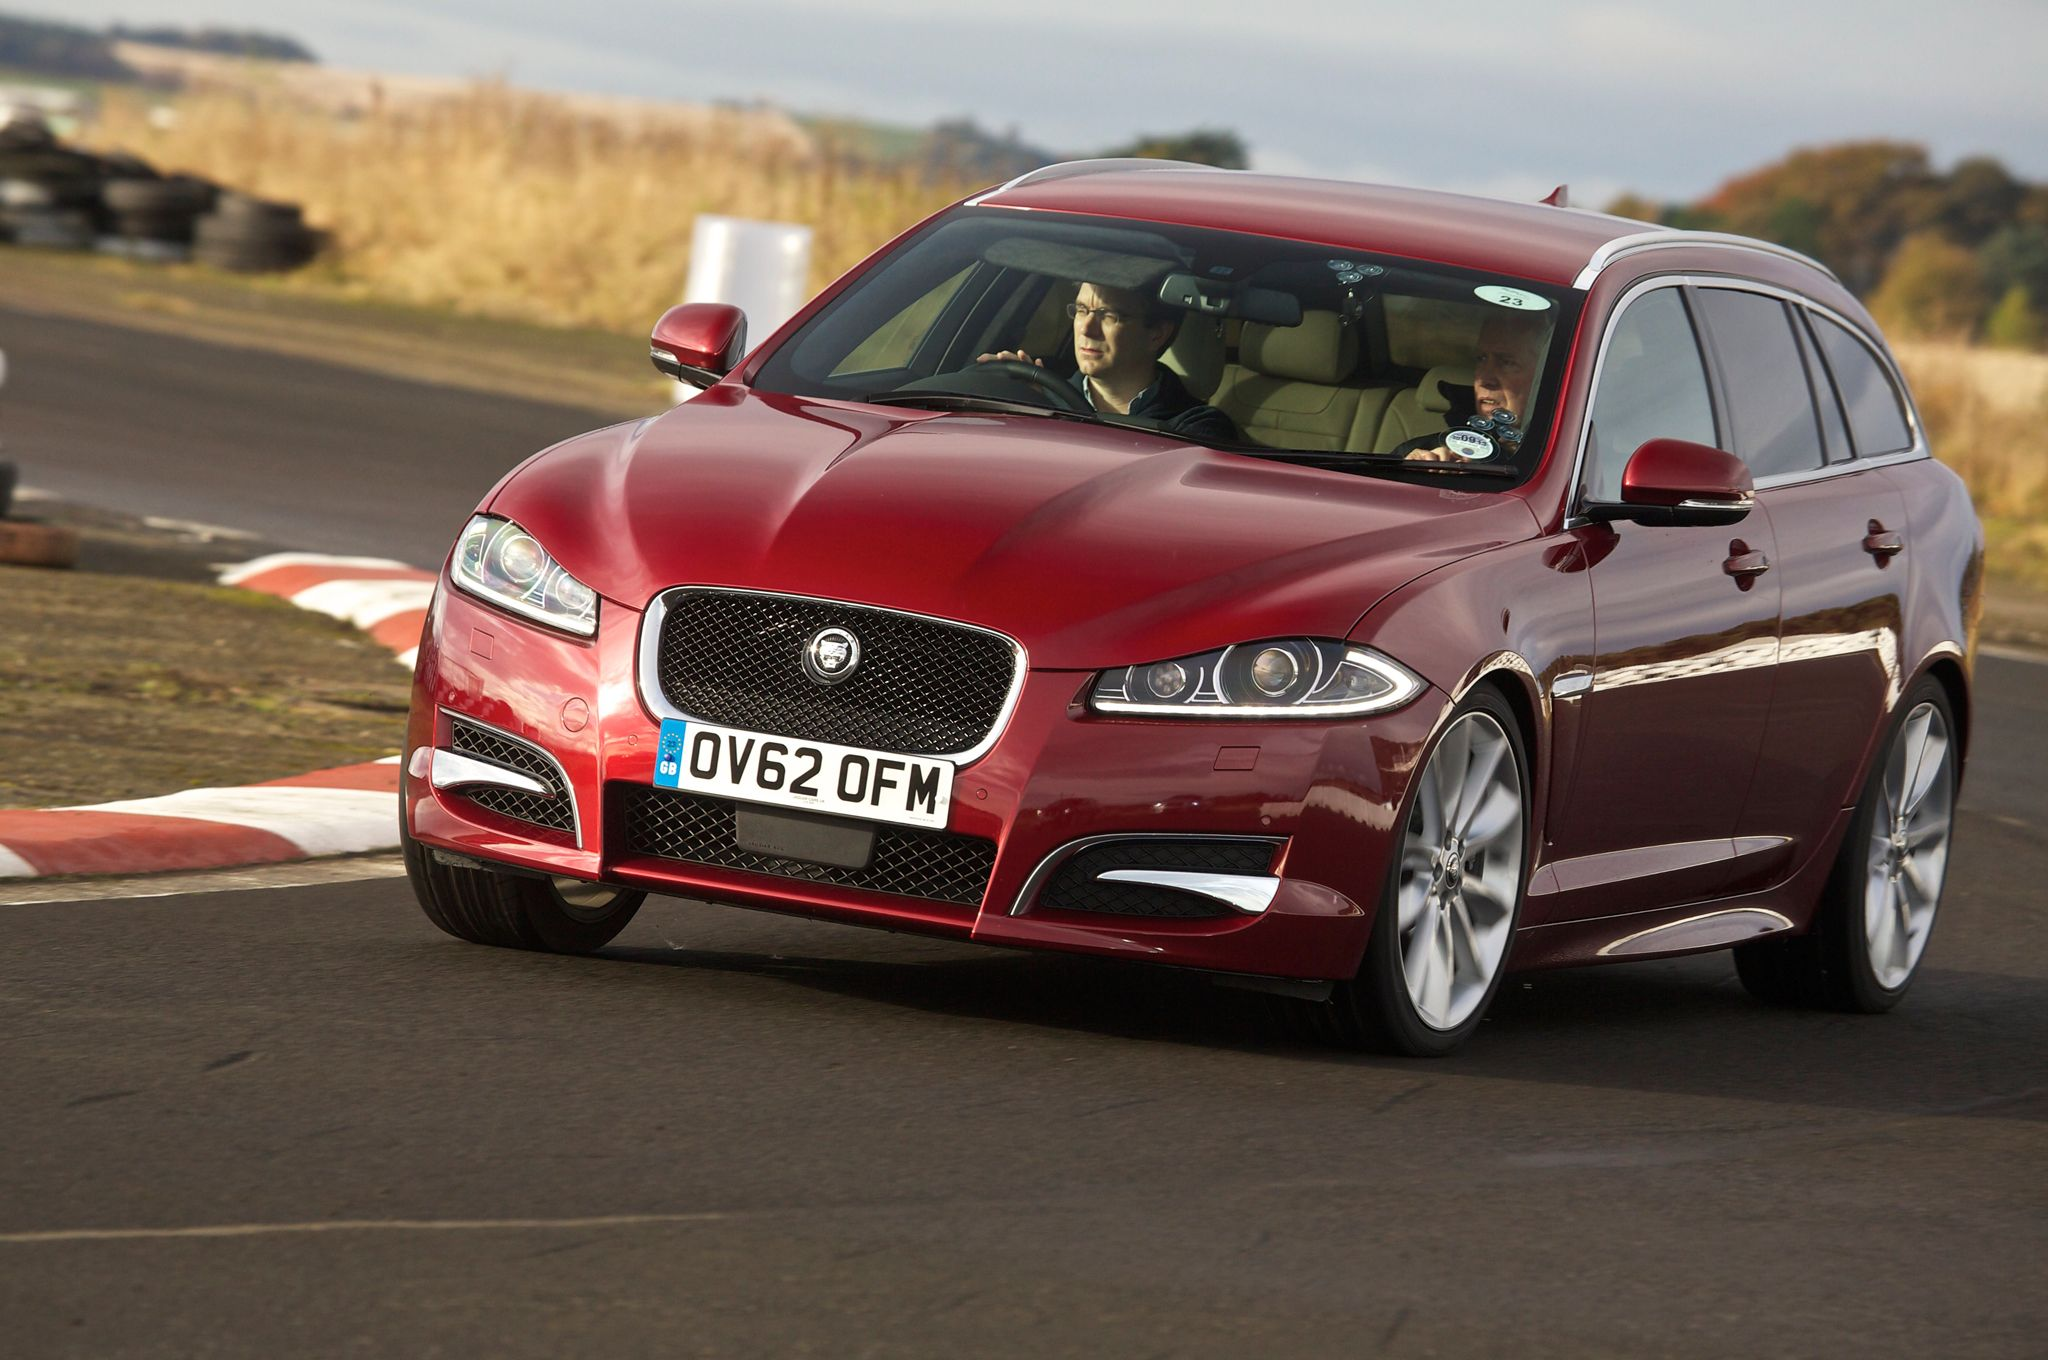 Jaguar Will Offer Wagons In The Future Just Not An Xe Sportbrake Automobile Jaguar Jaguar Xf Wagons